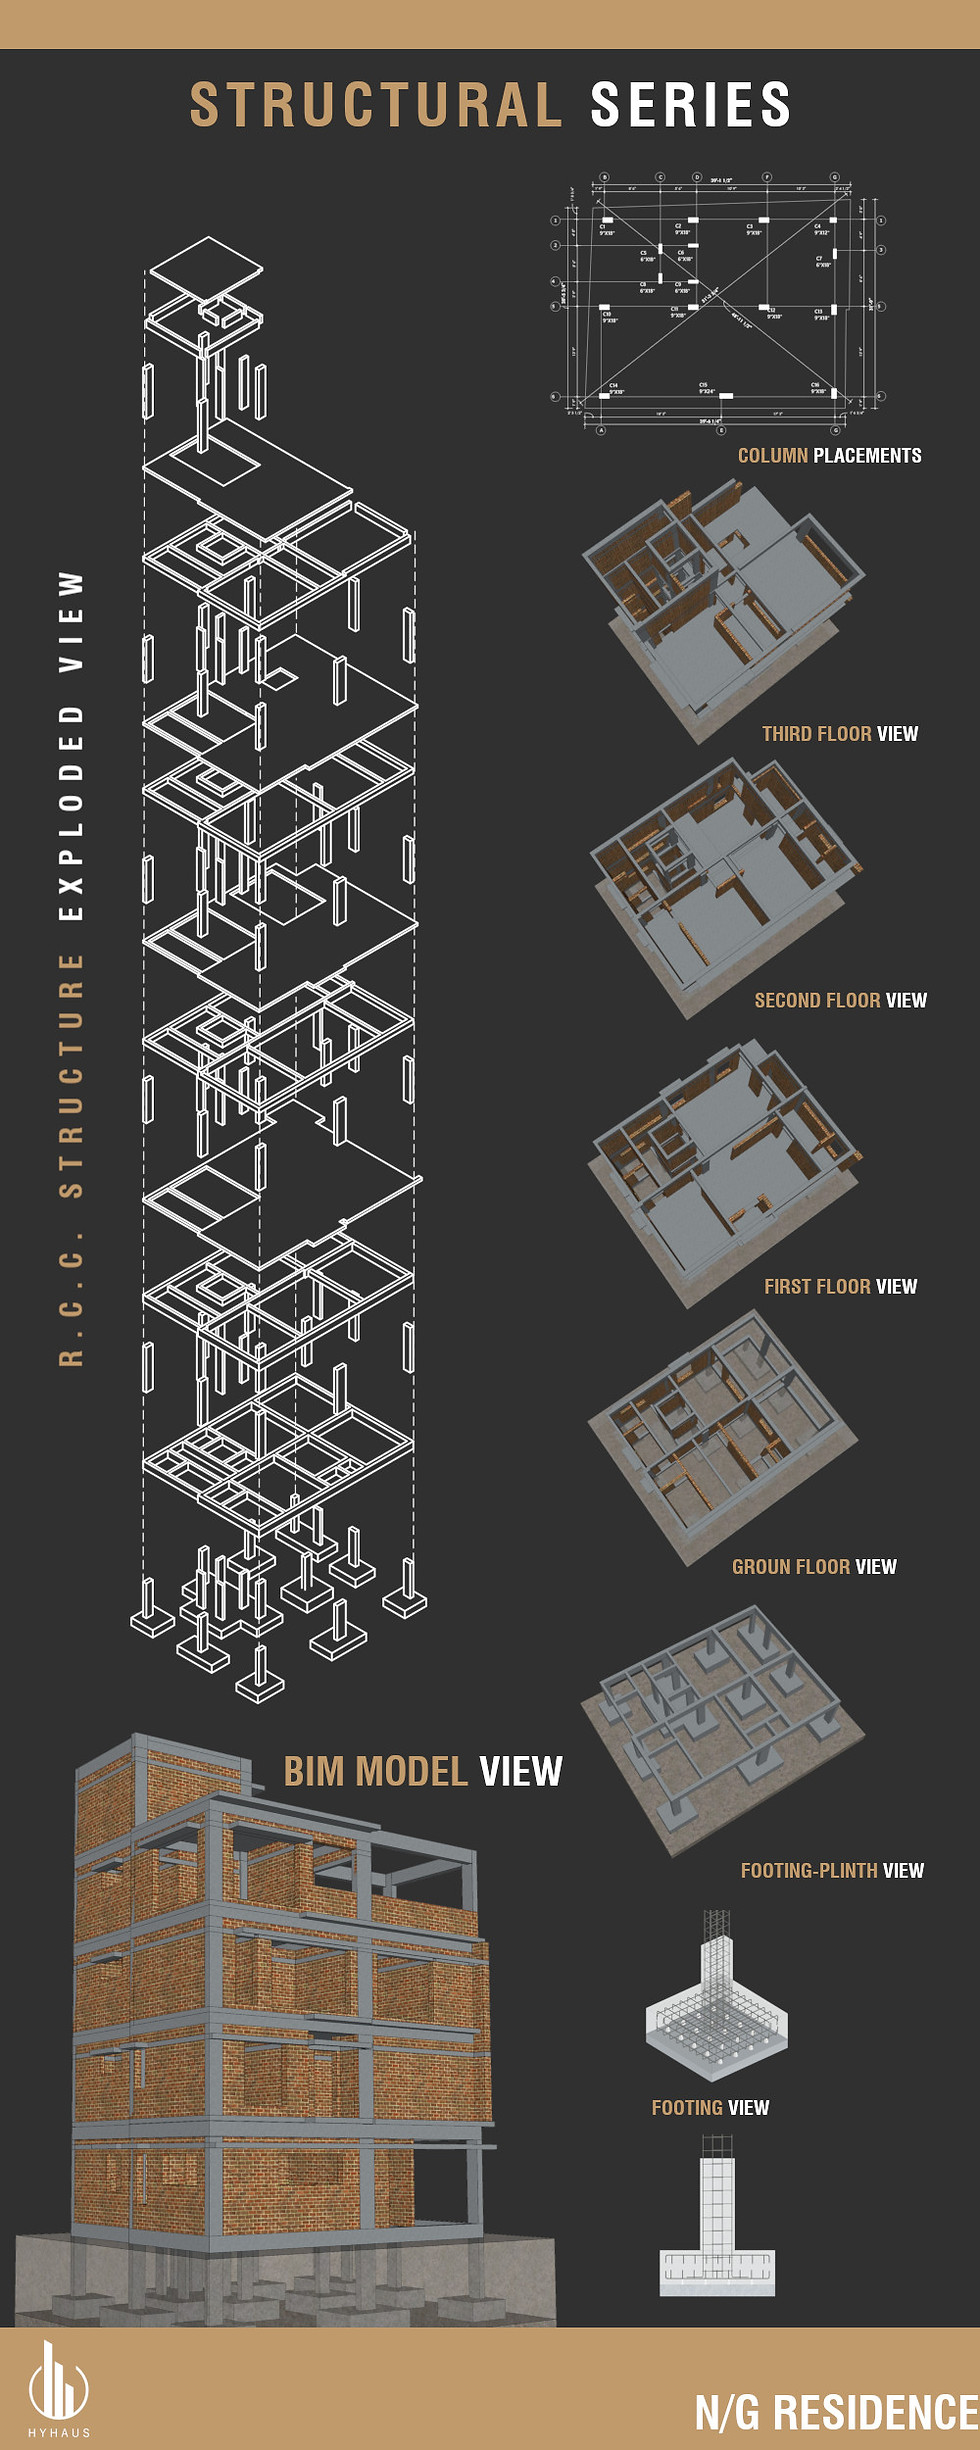 structural series suneel.JPG